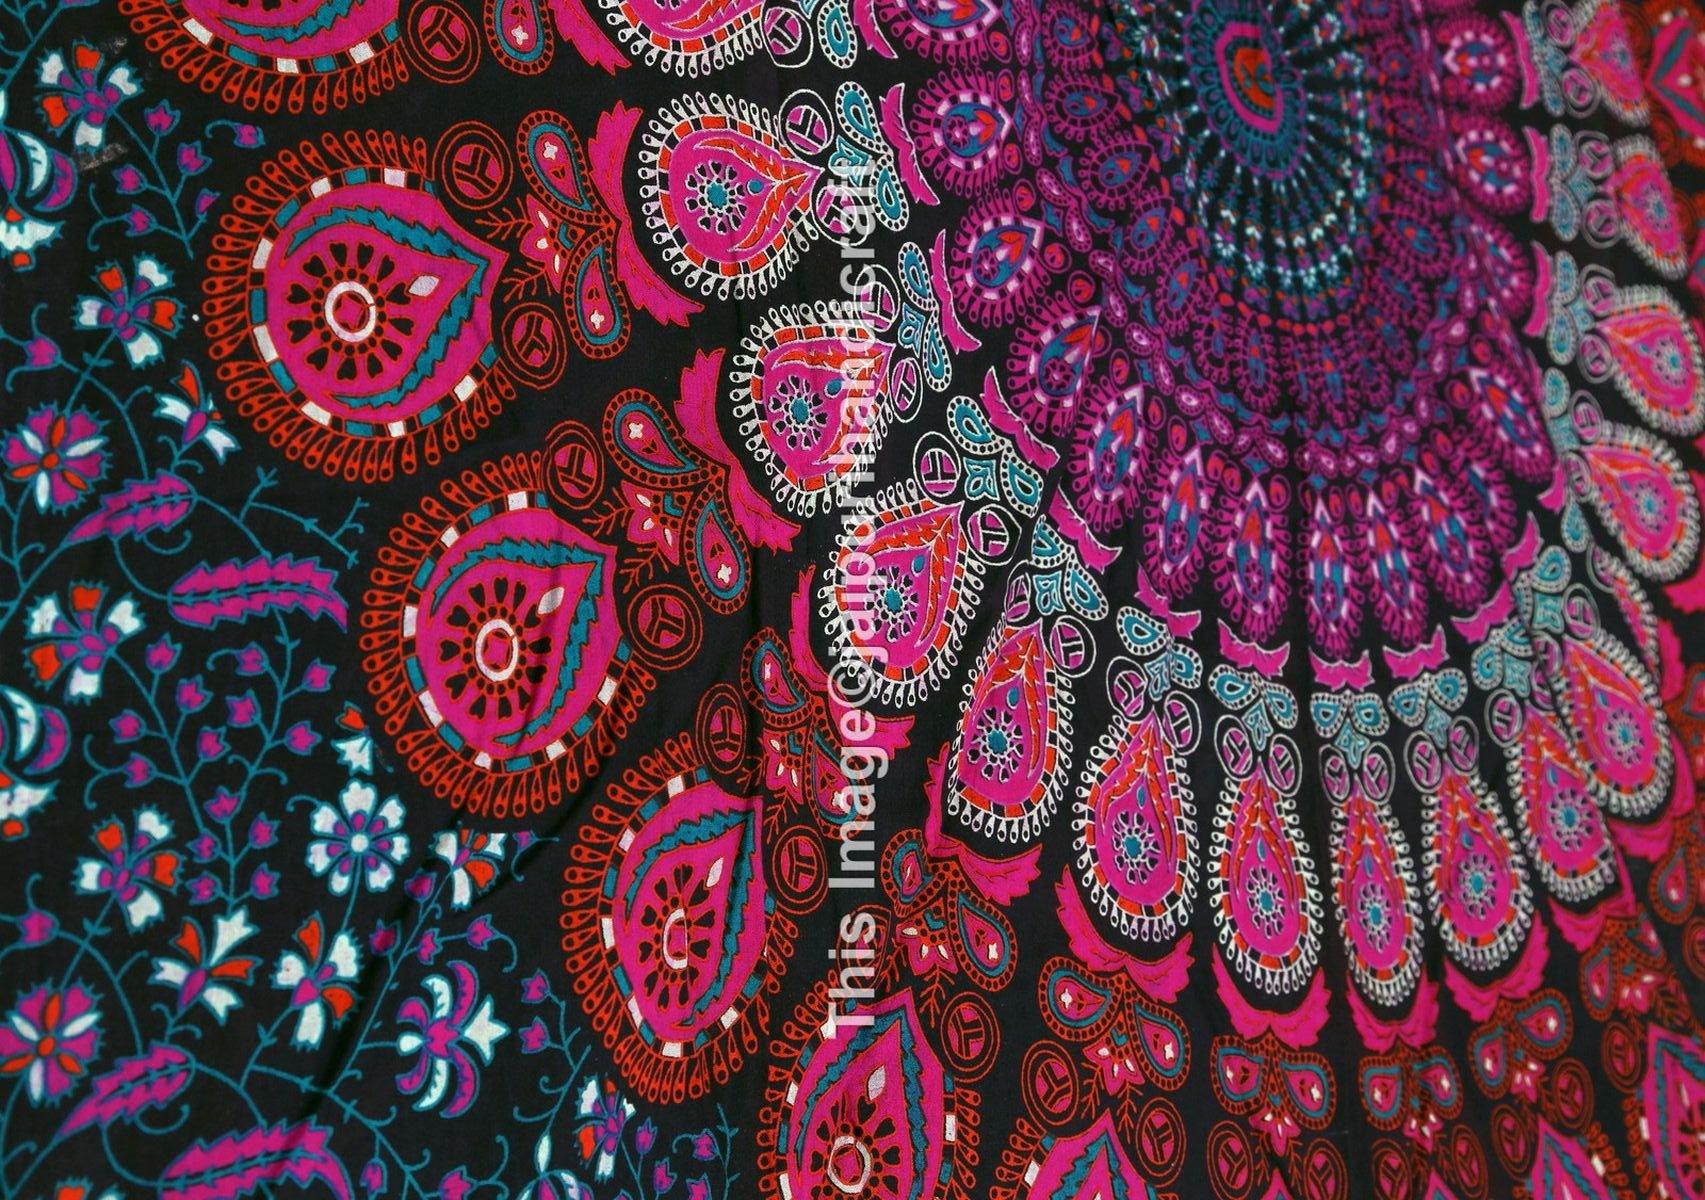 Wall Hanging Art Deco Tapestry : Mandala bohemian tapestry wall hanging psychedelic